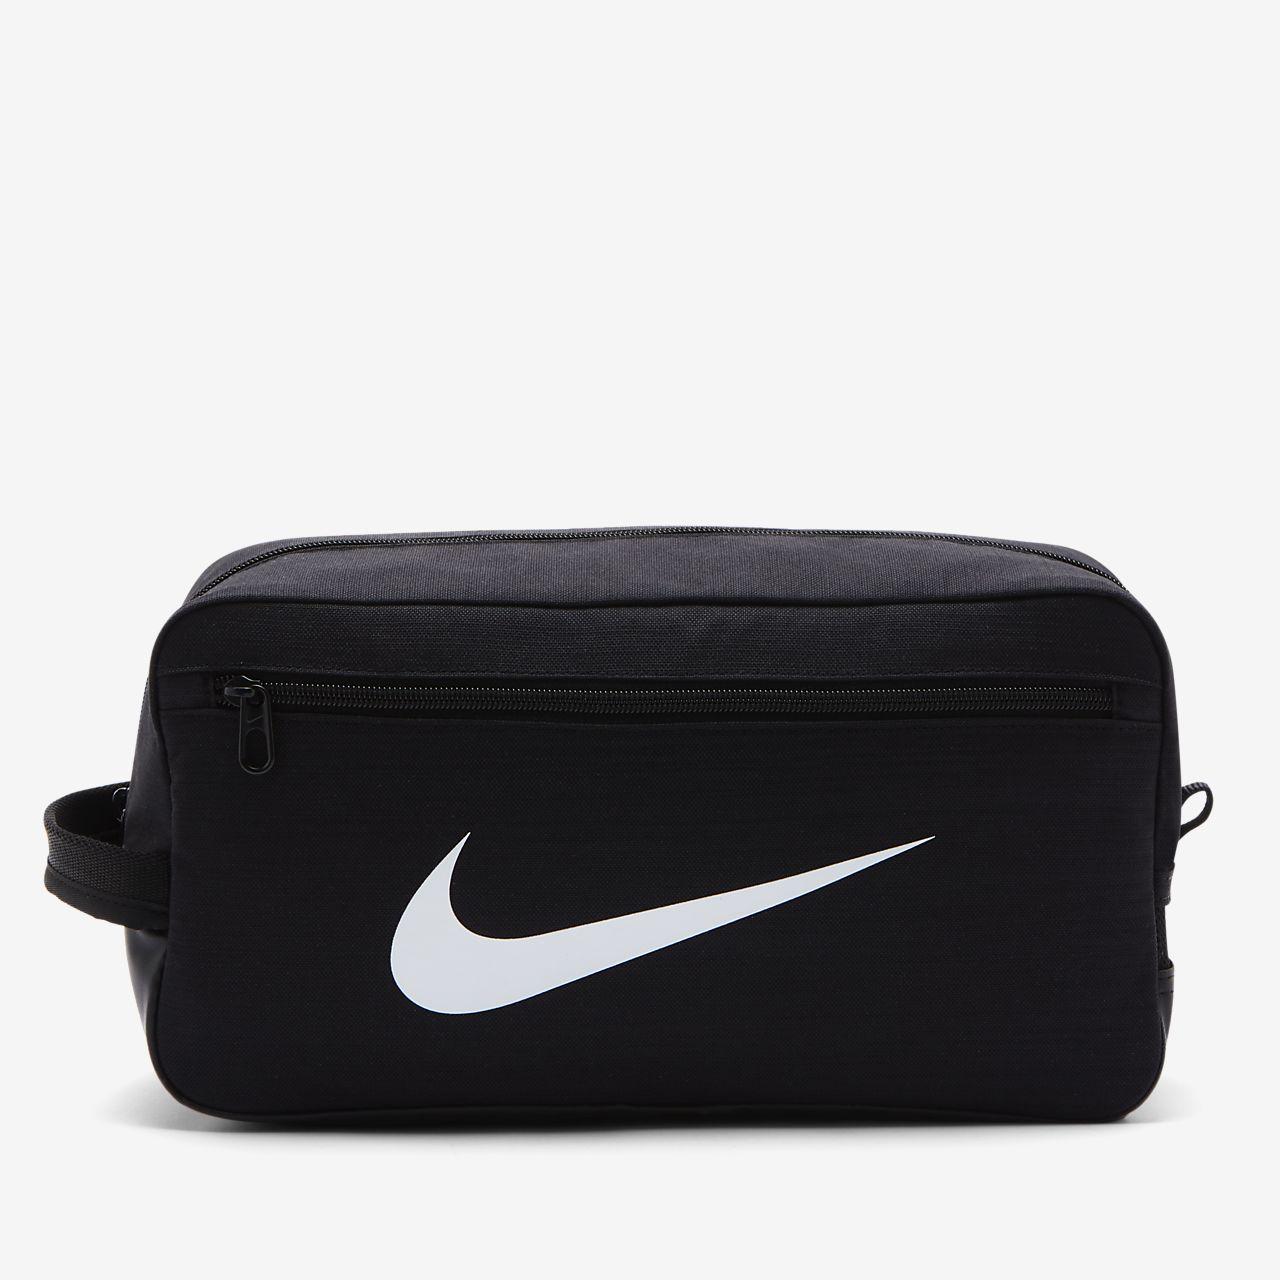 Entrenamiento Nike De Bolso El BrasiliaMx Para Calzado XZulOiTPkw